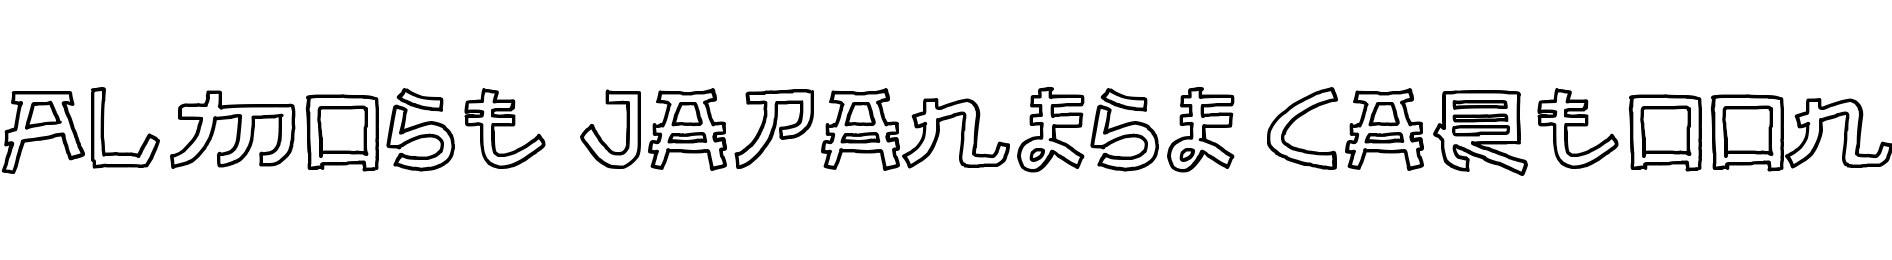 Almost Japanese Cartoon